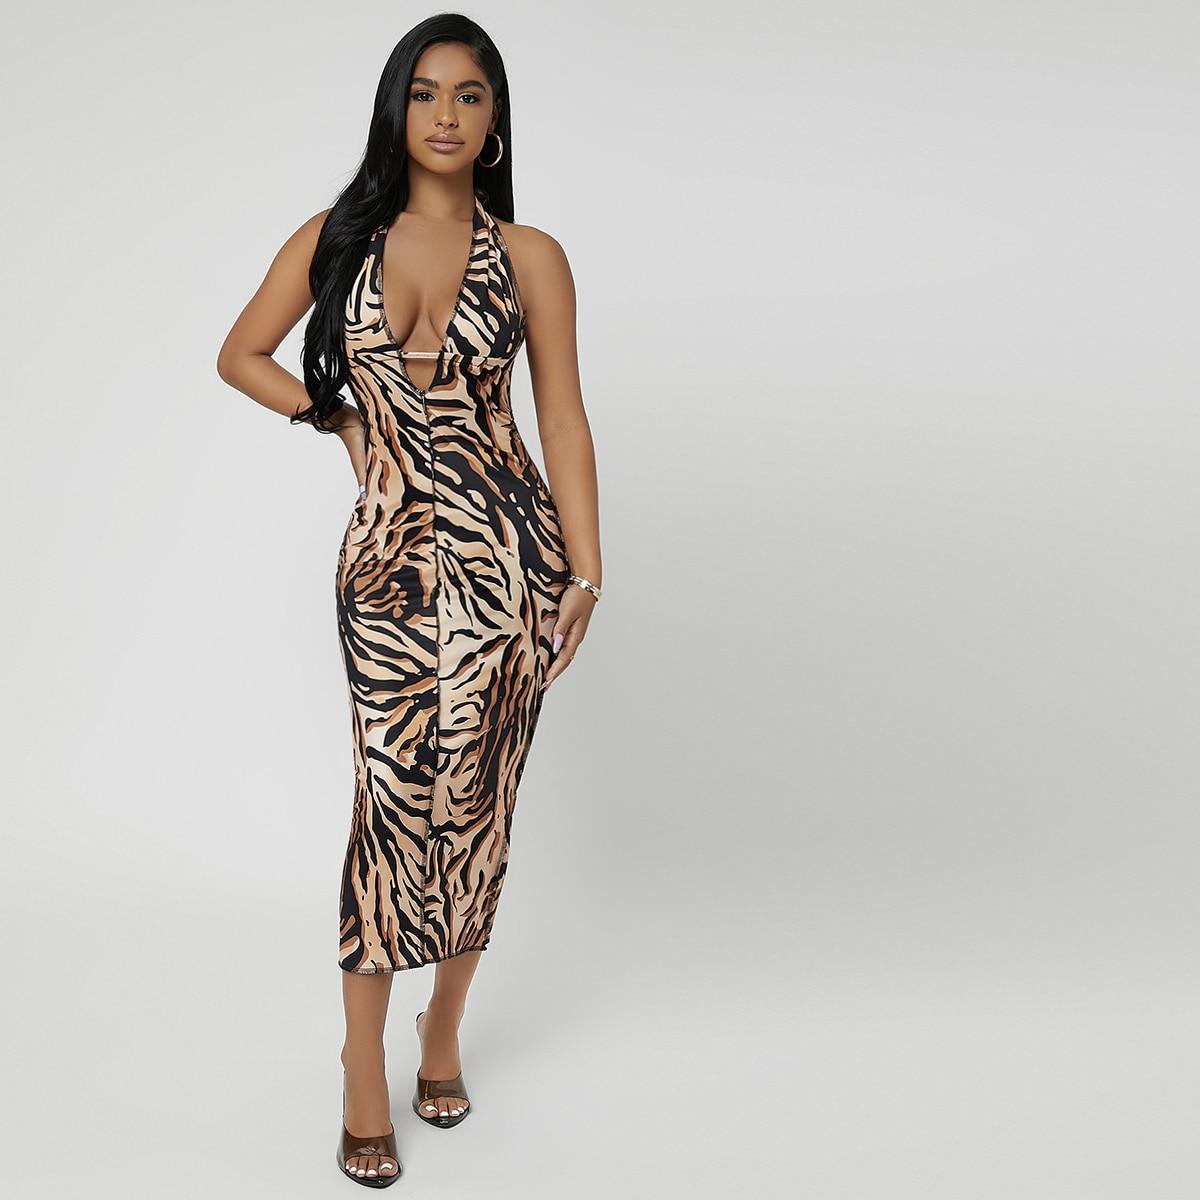 Self Tie Backless Tiger Striped Print Bodycon Dress